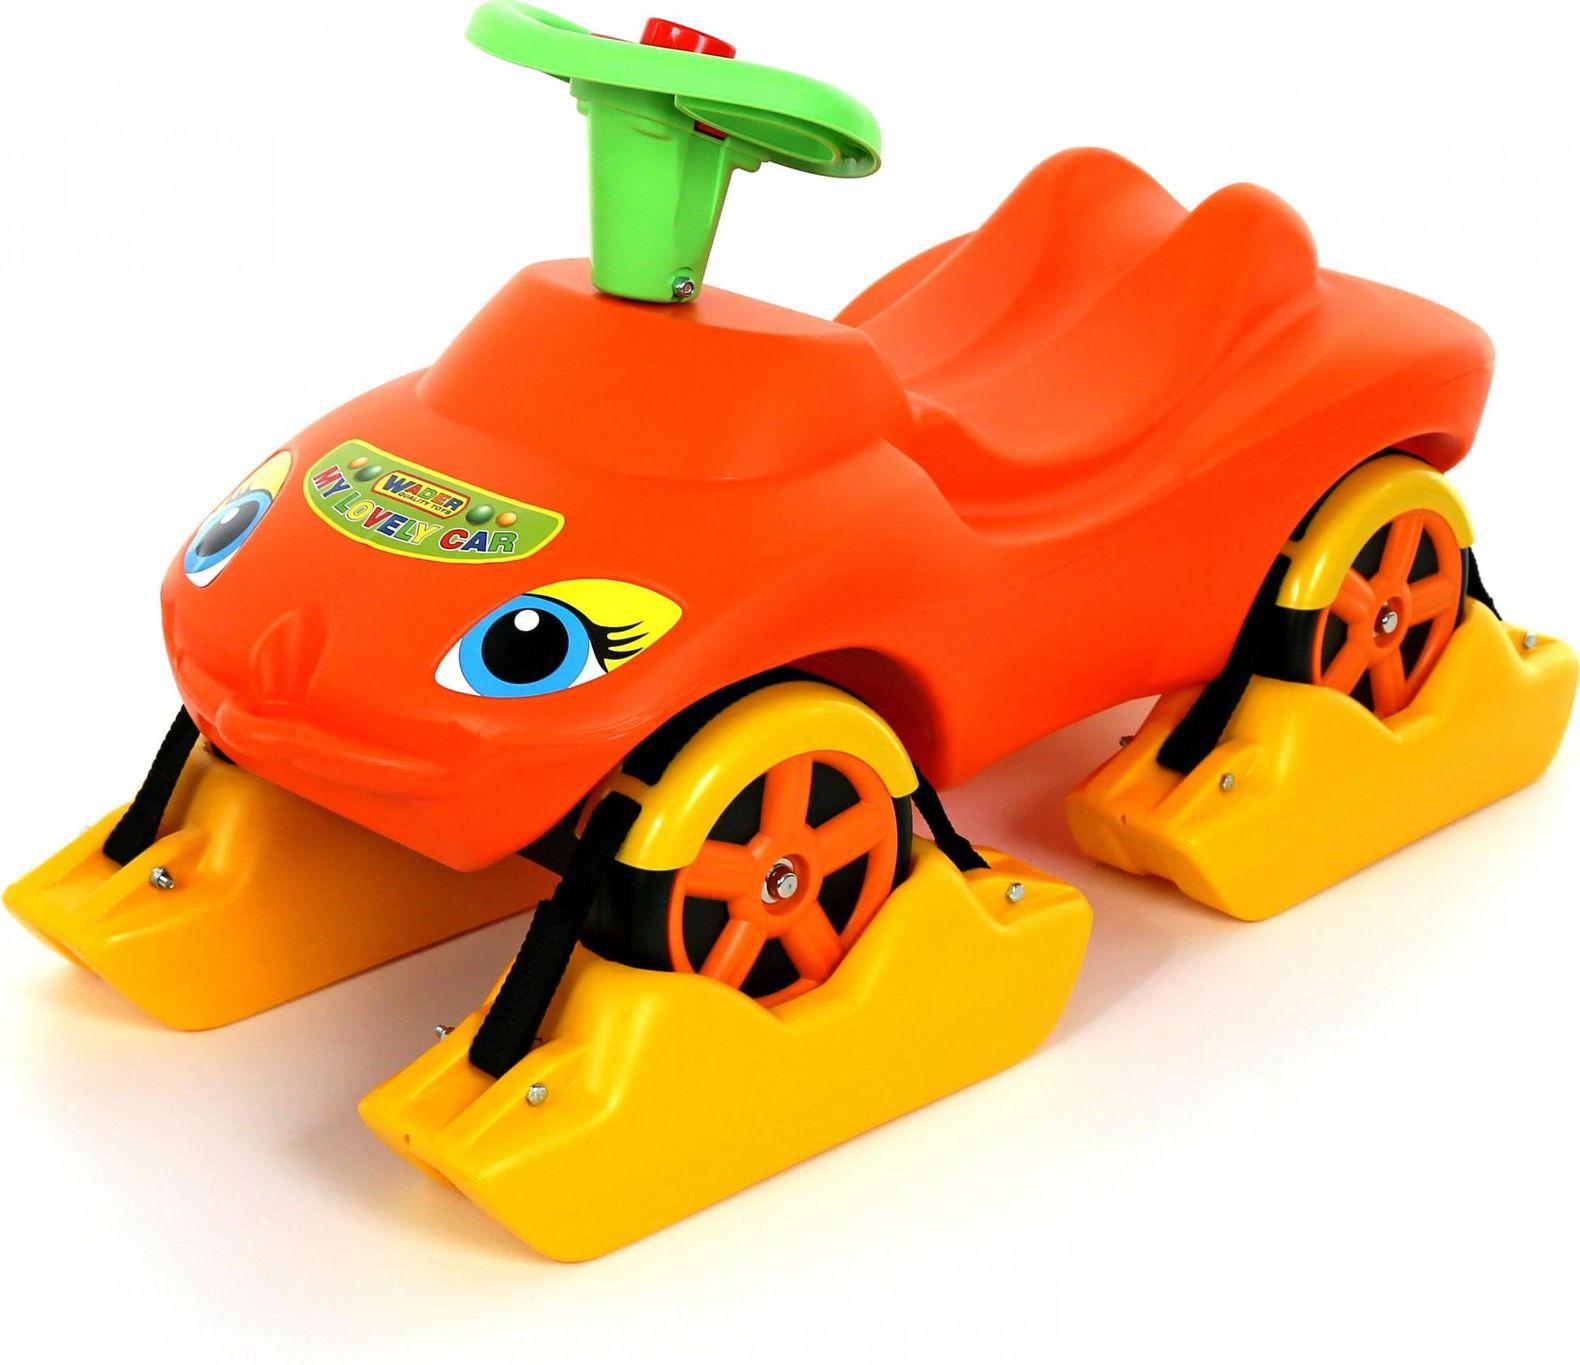 Wheelchair My favorite car orange with snooze multifunction my favorite bear